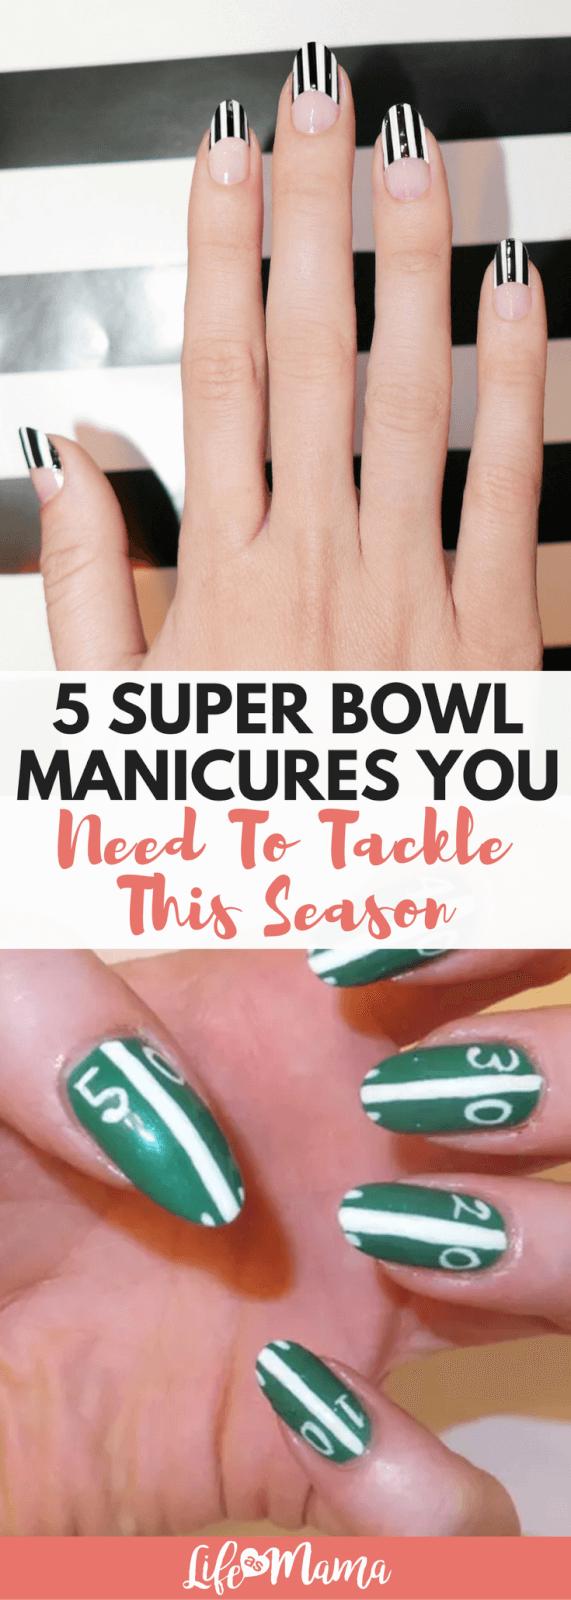 super bowl manicures